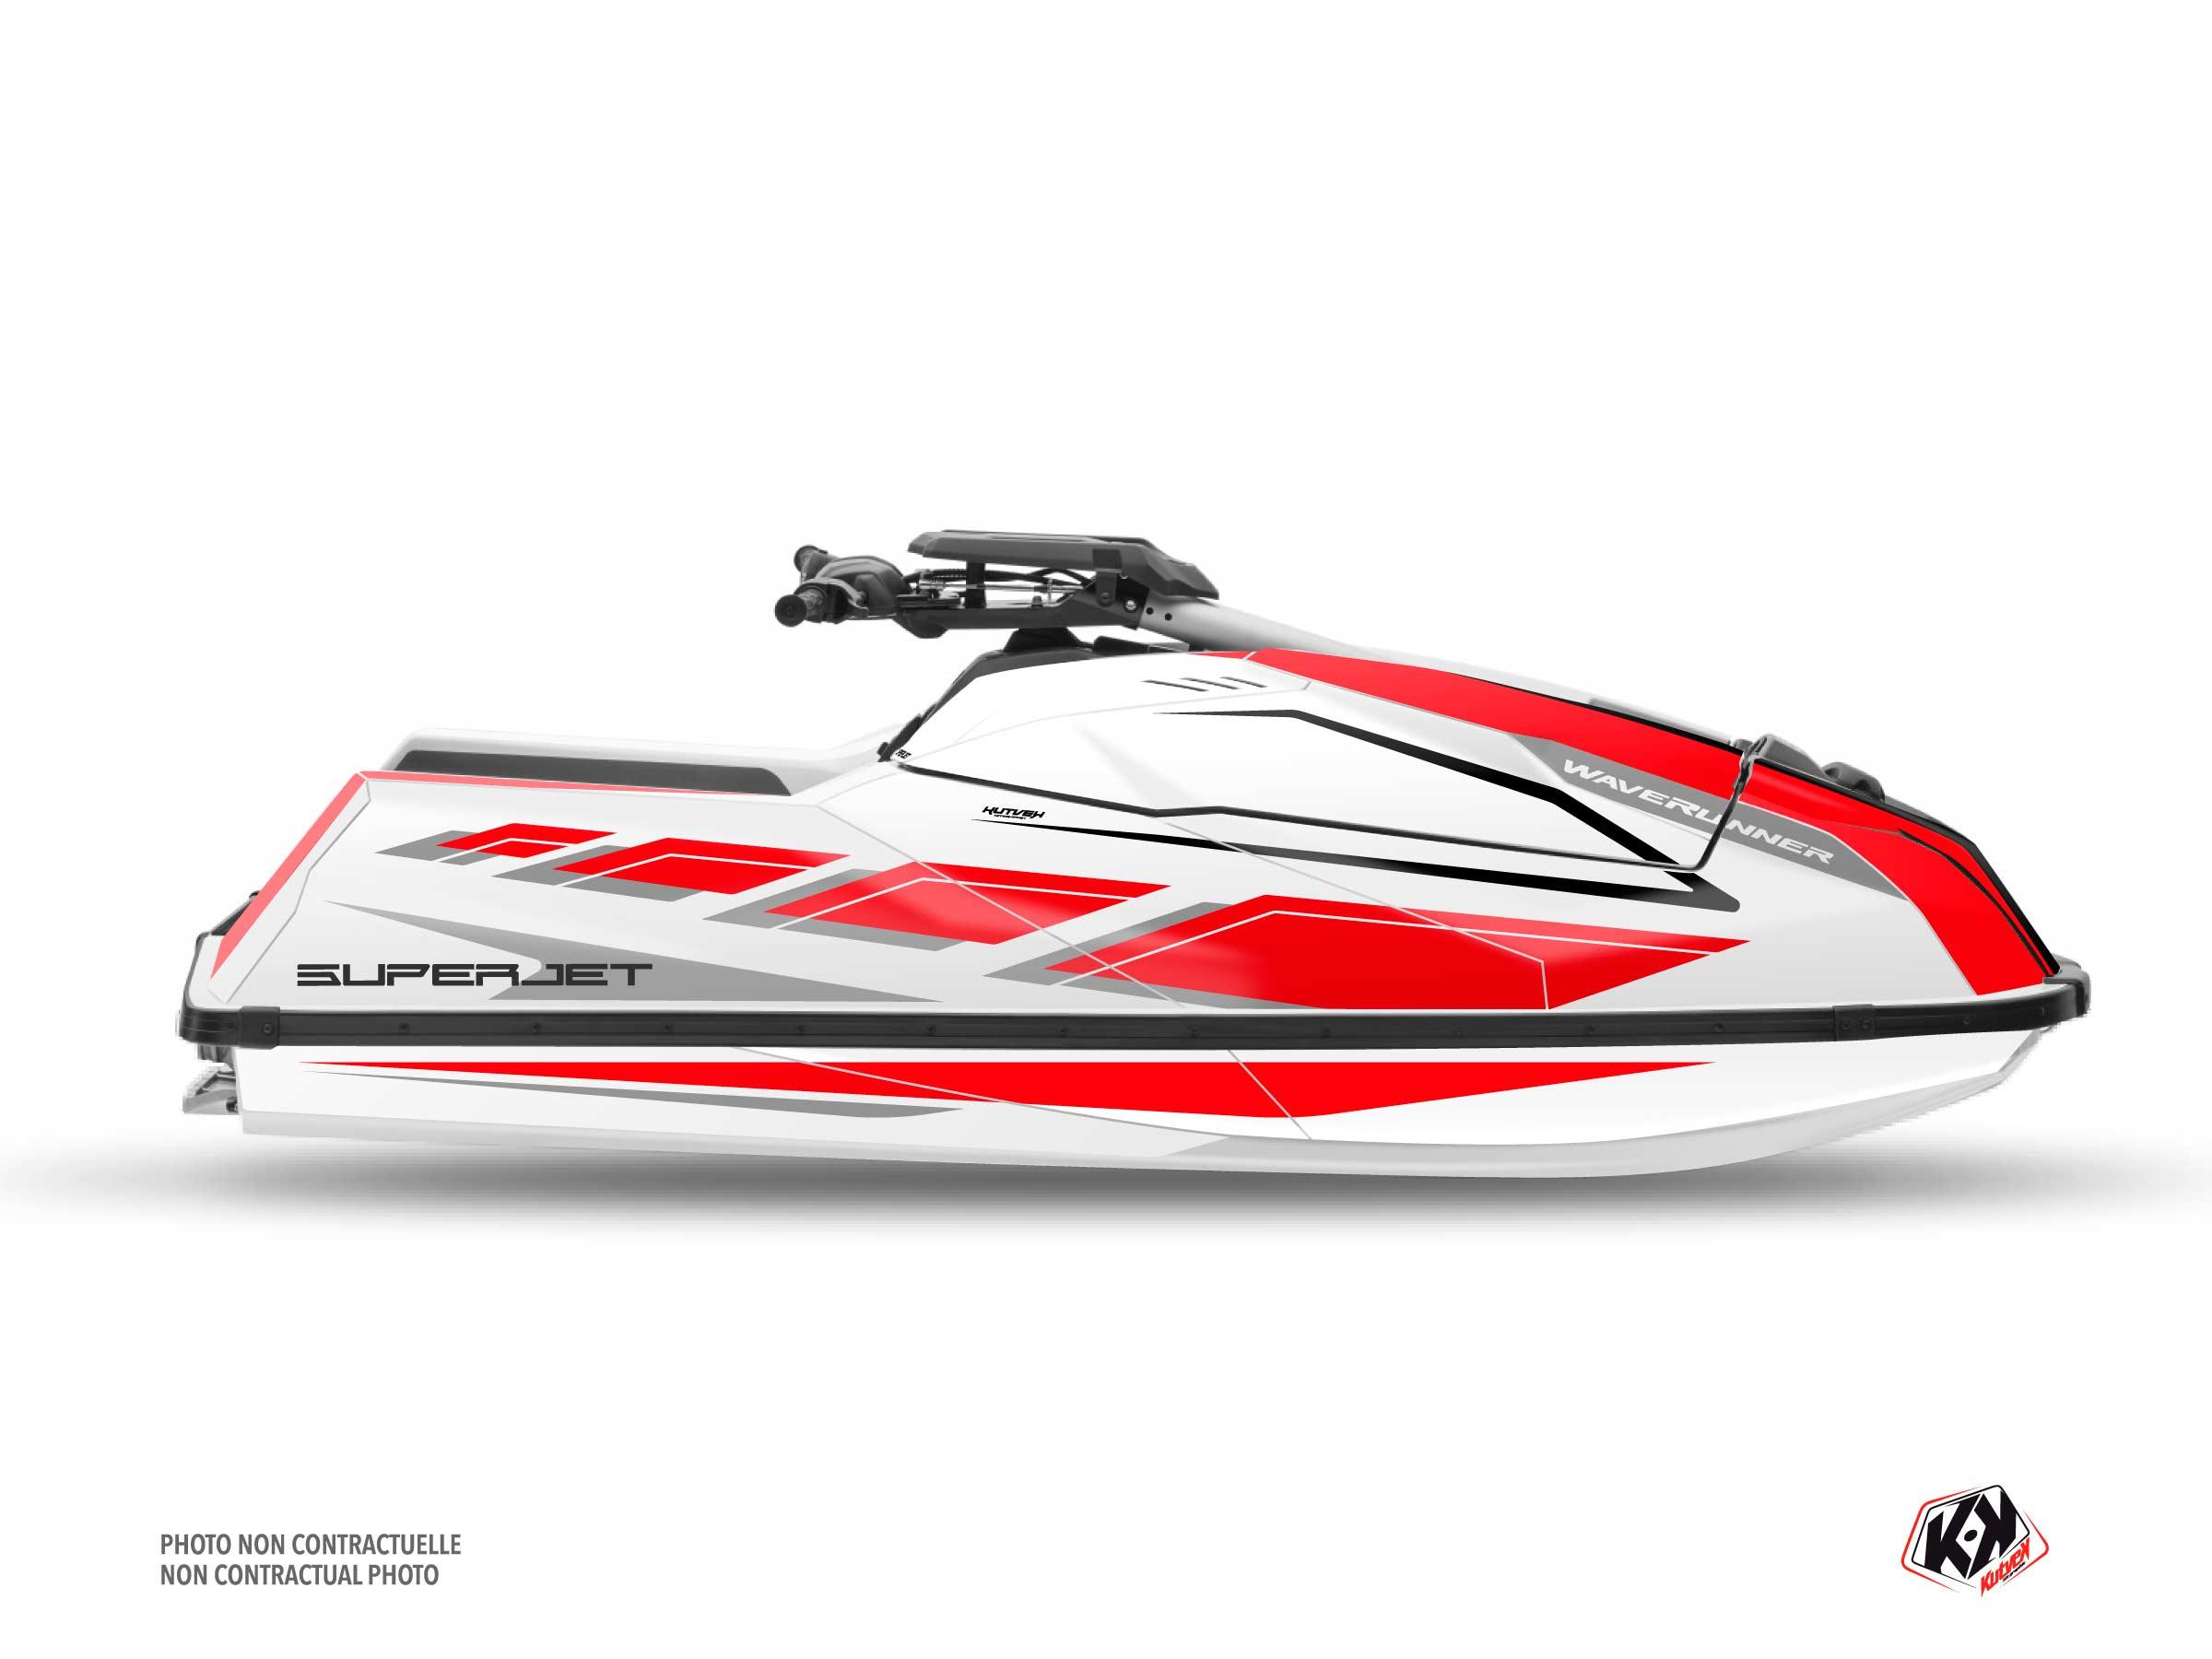 Kit Déco Jet-Ski PERF Yamaha Superjet 2021 Rouge